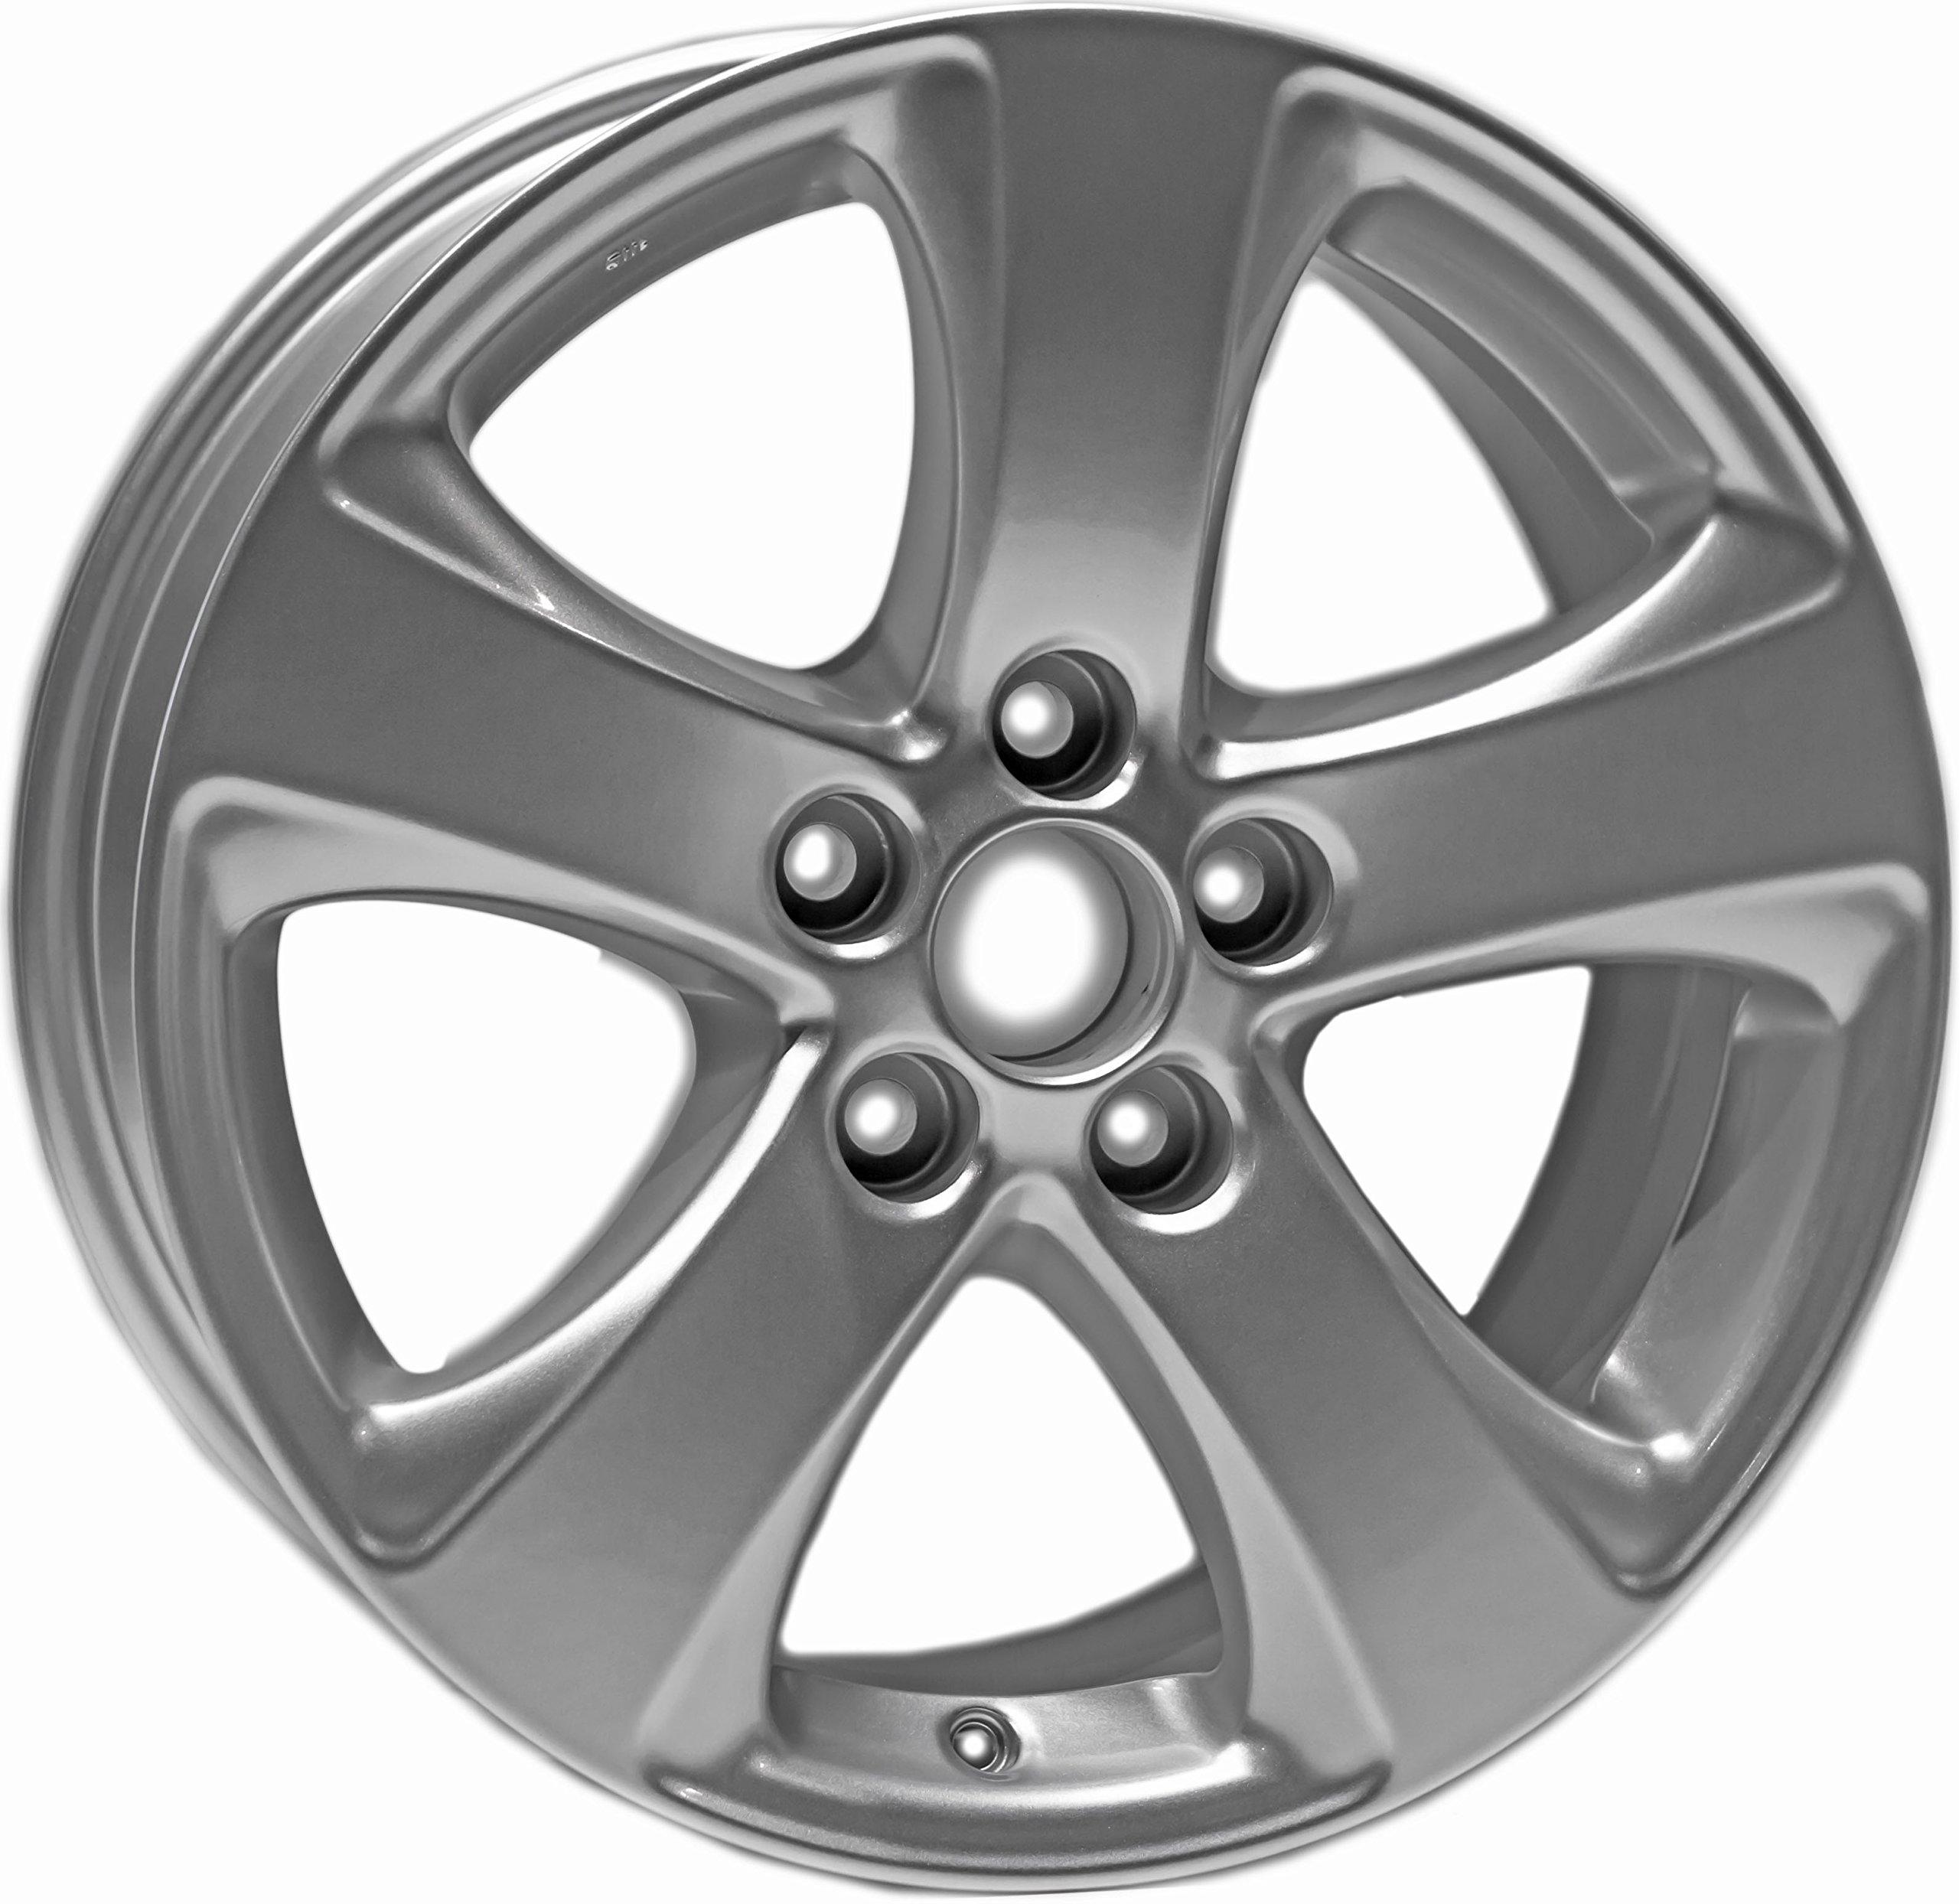 Dorman 939-720 Aluminum Wheel (17x7''/5x114.3mm) by Dorman